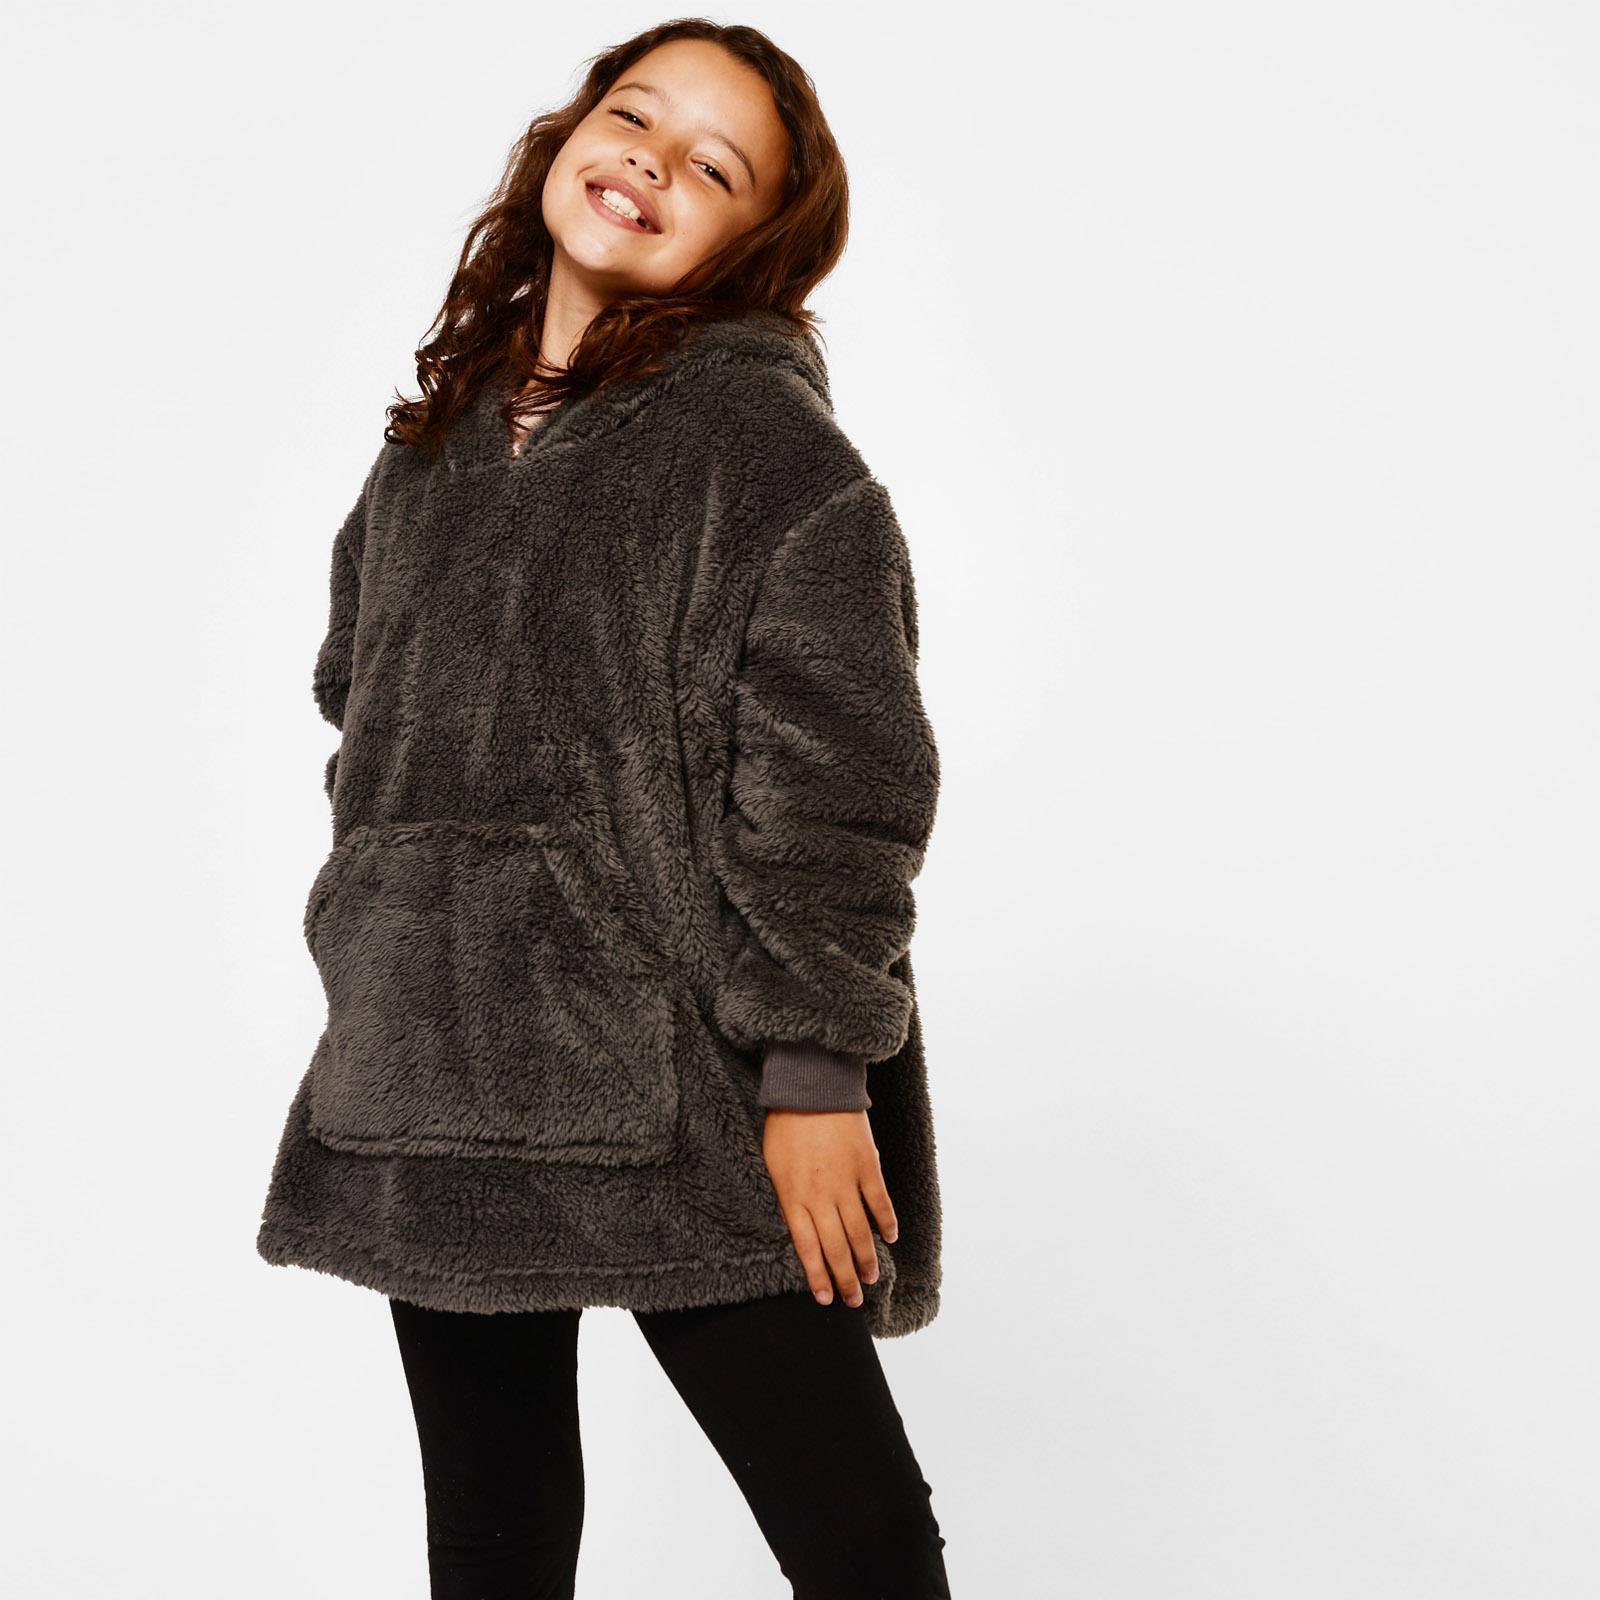 thumbnail 21 - Brentfords-Teddy-Fleece-Hoodie-Blanket-Oversized-Giant-Wearable-Adults-Kids-UK